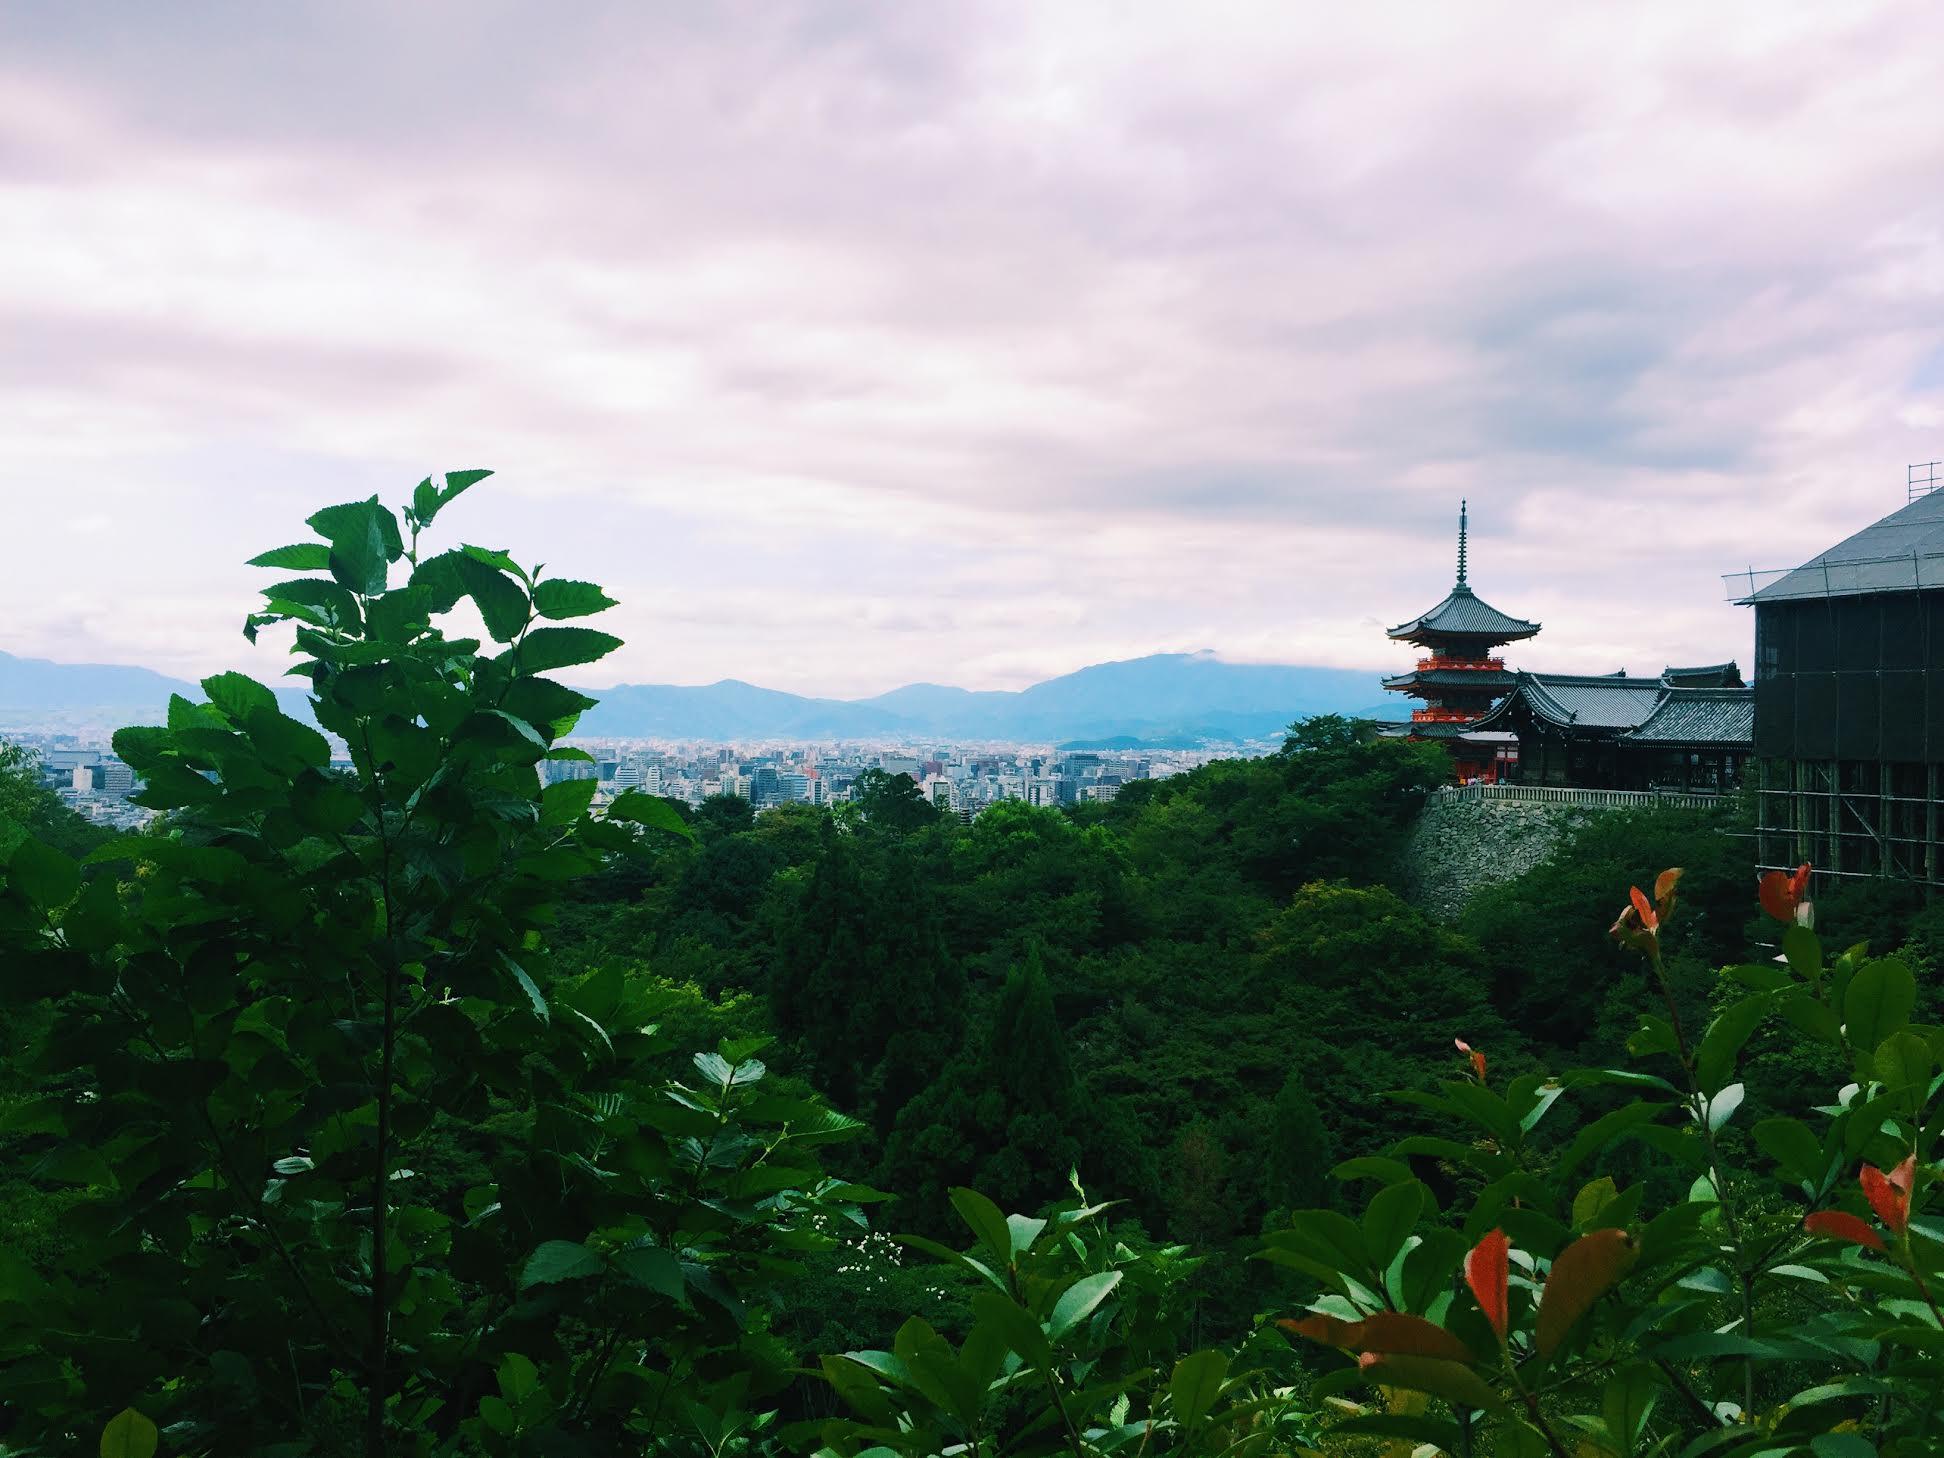 Halal-travel-tips-Kyoto-Kiyomizu-dera-view2.jpg